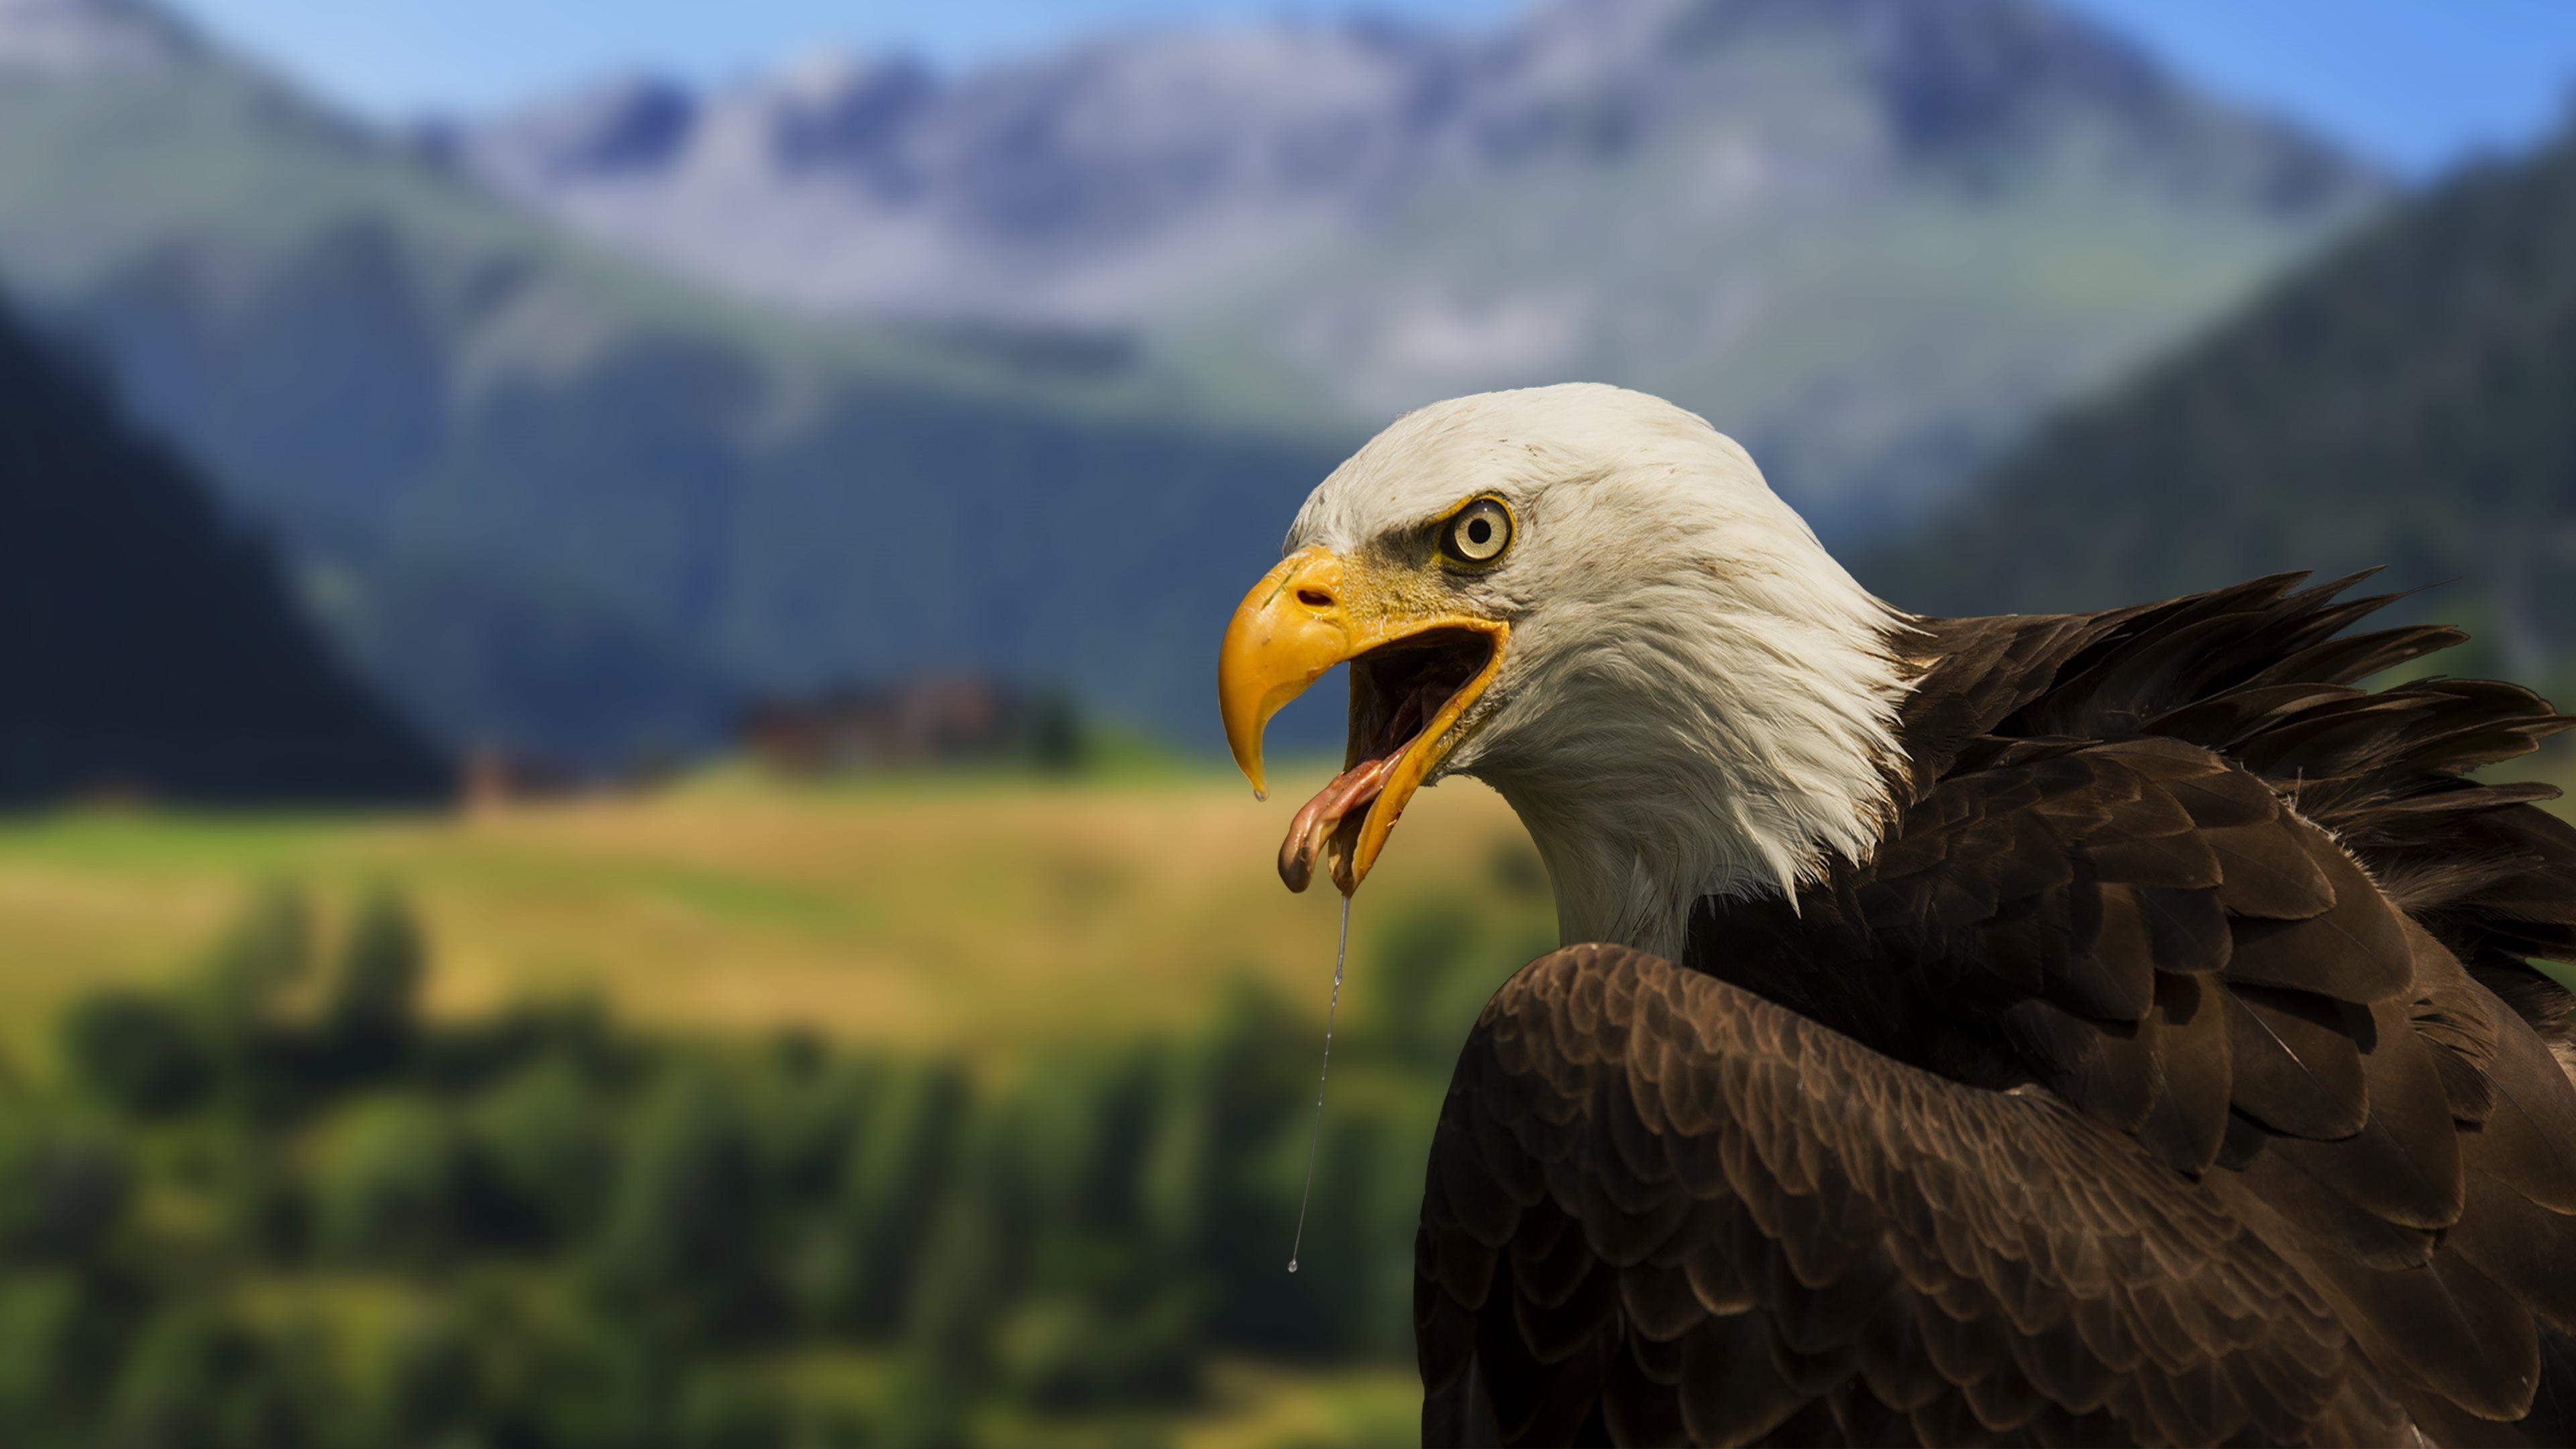 Bald Eagle 4k Wallpaper Full 1080p Ultra Hd Wallpapers - 1080p Full Hd 4k , HD Wallpaper & Backgrounds